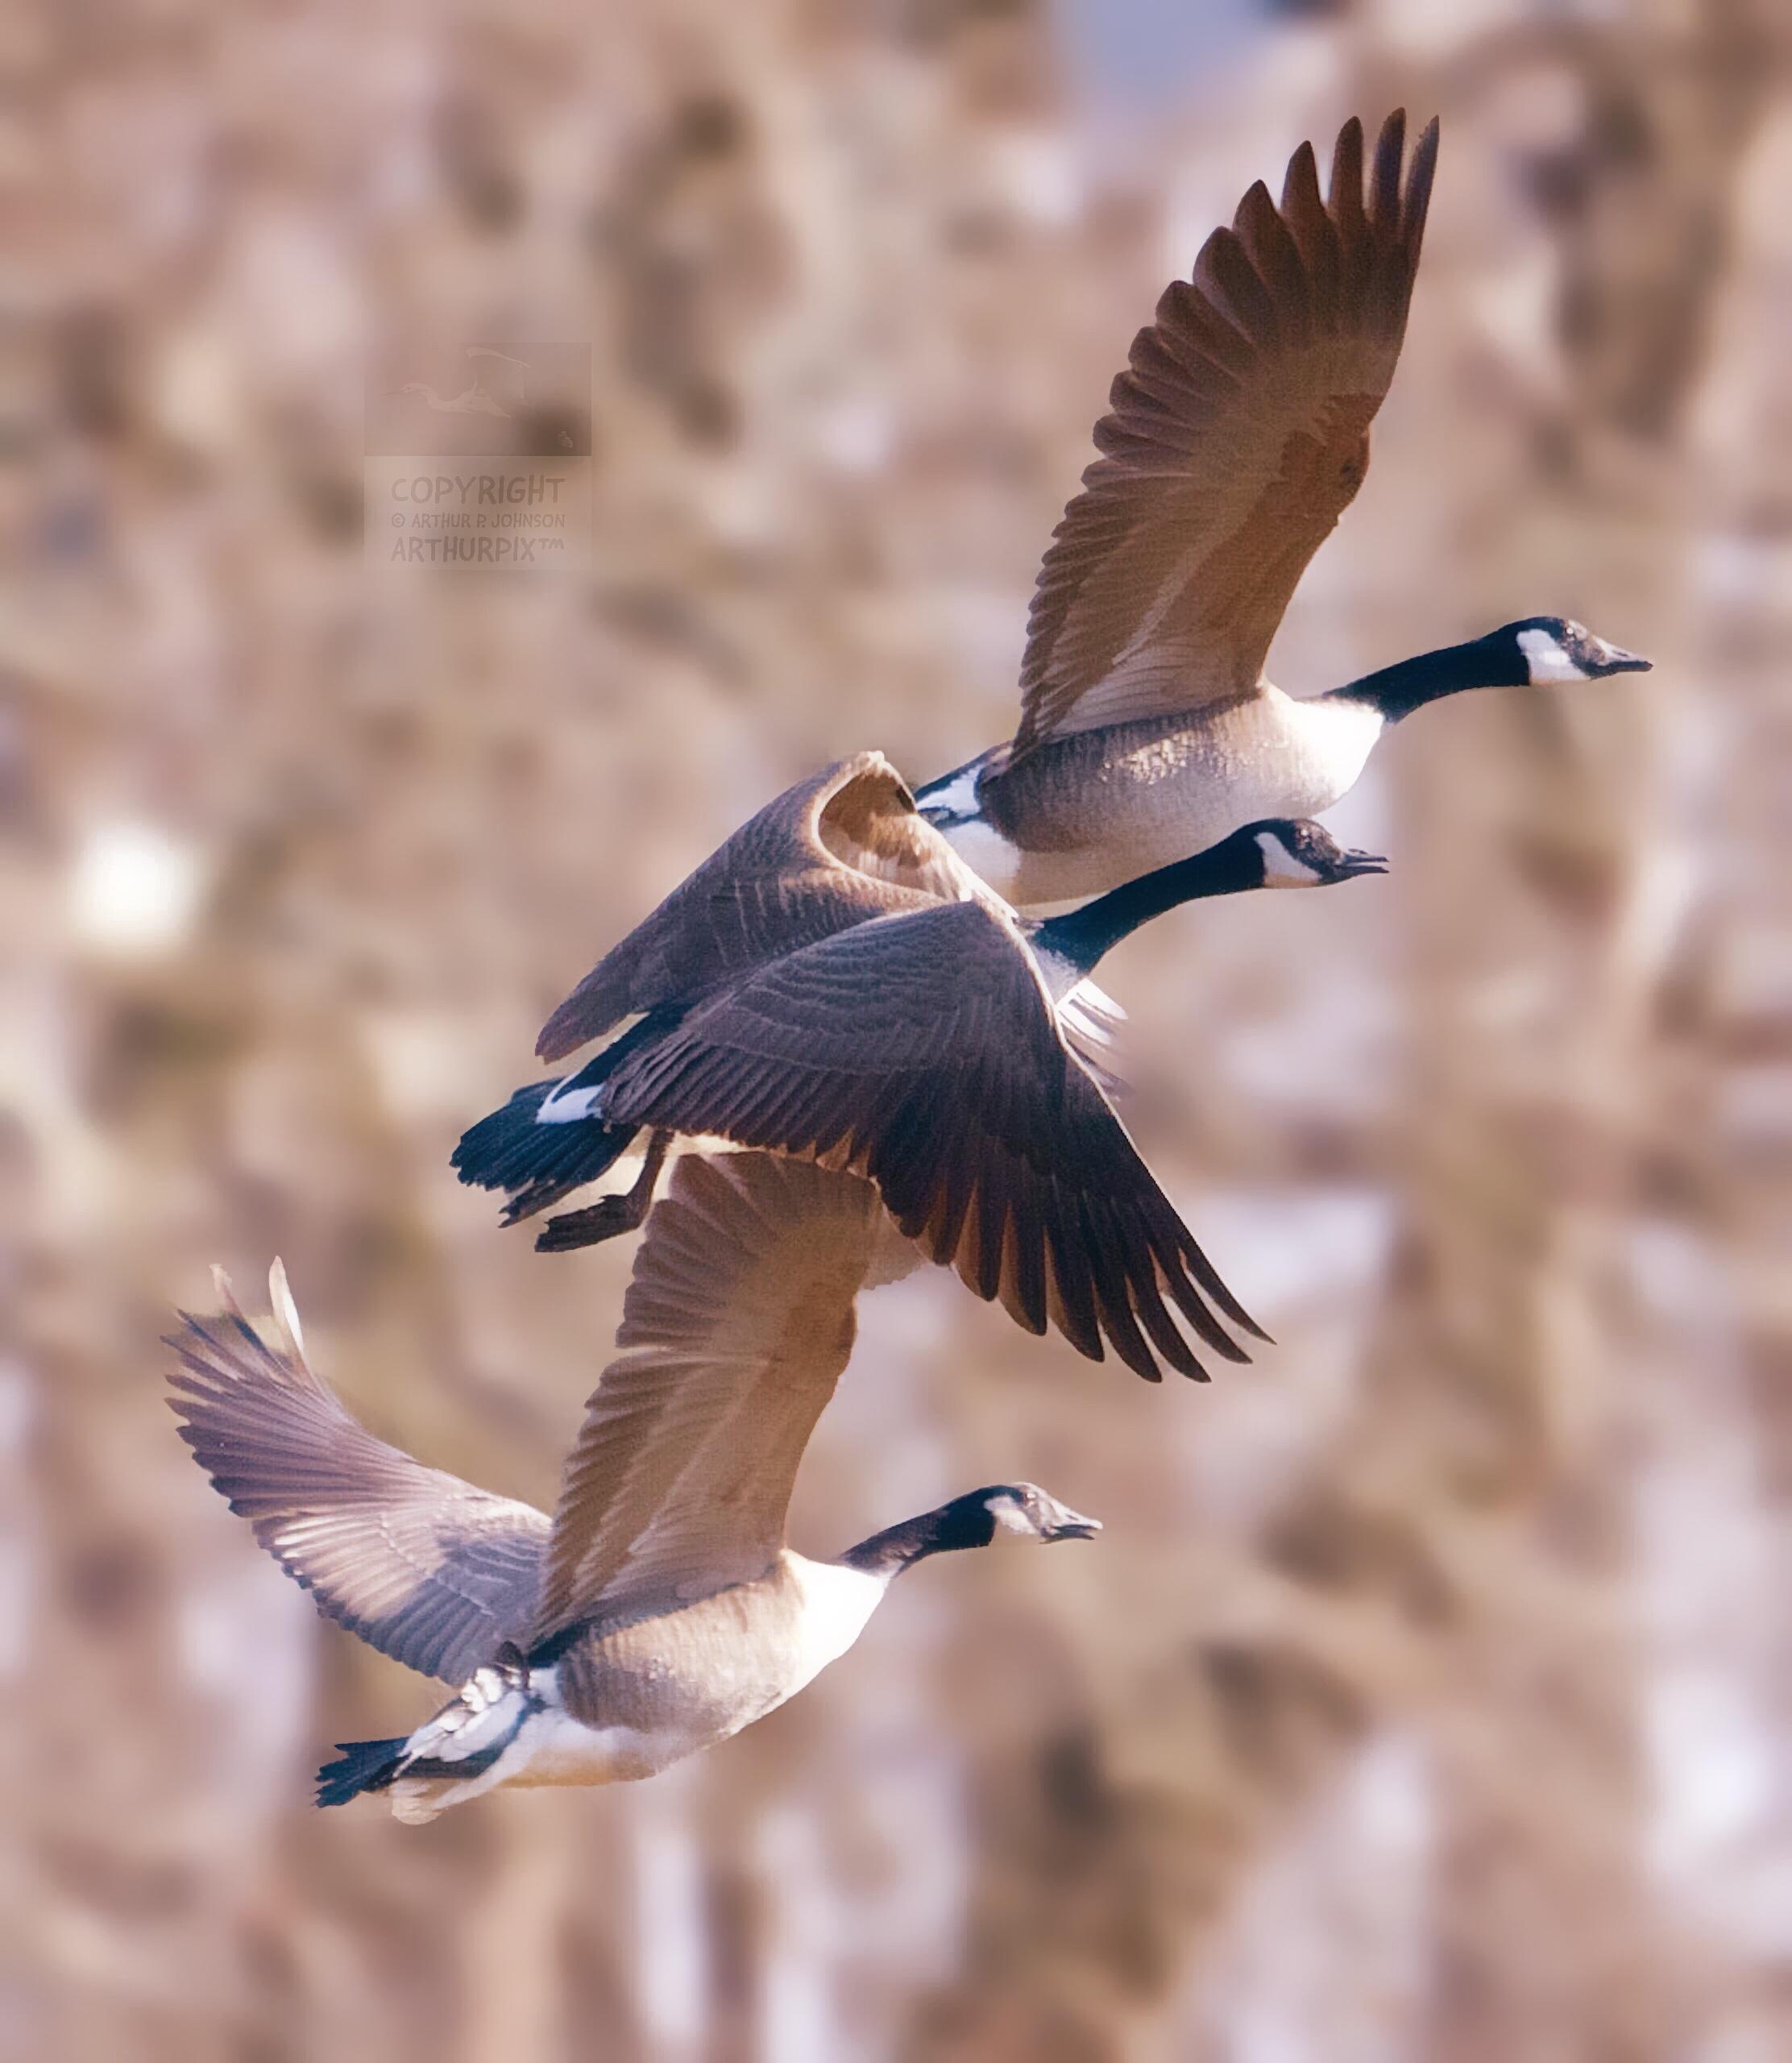 Three Canada Geese, rising skyward